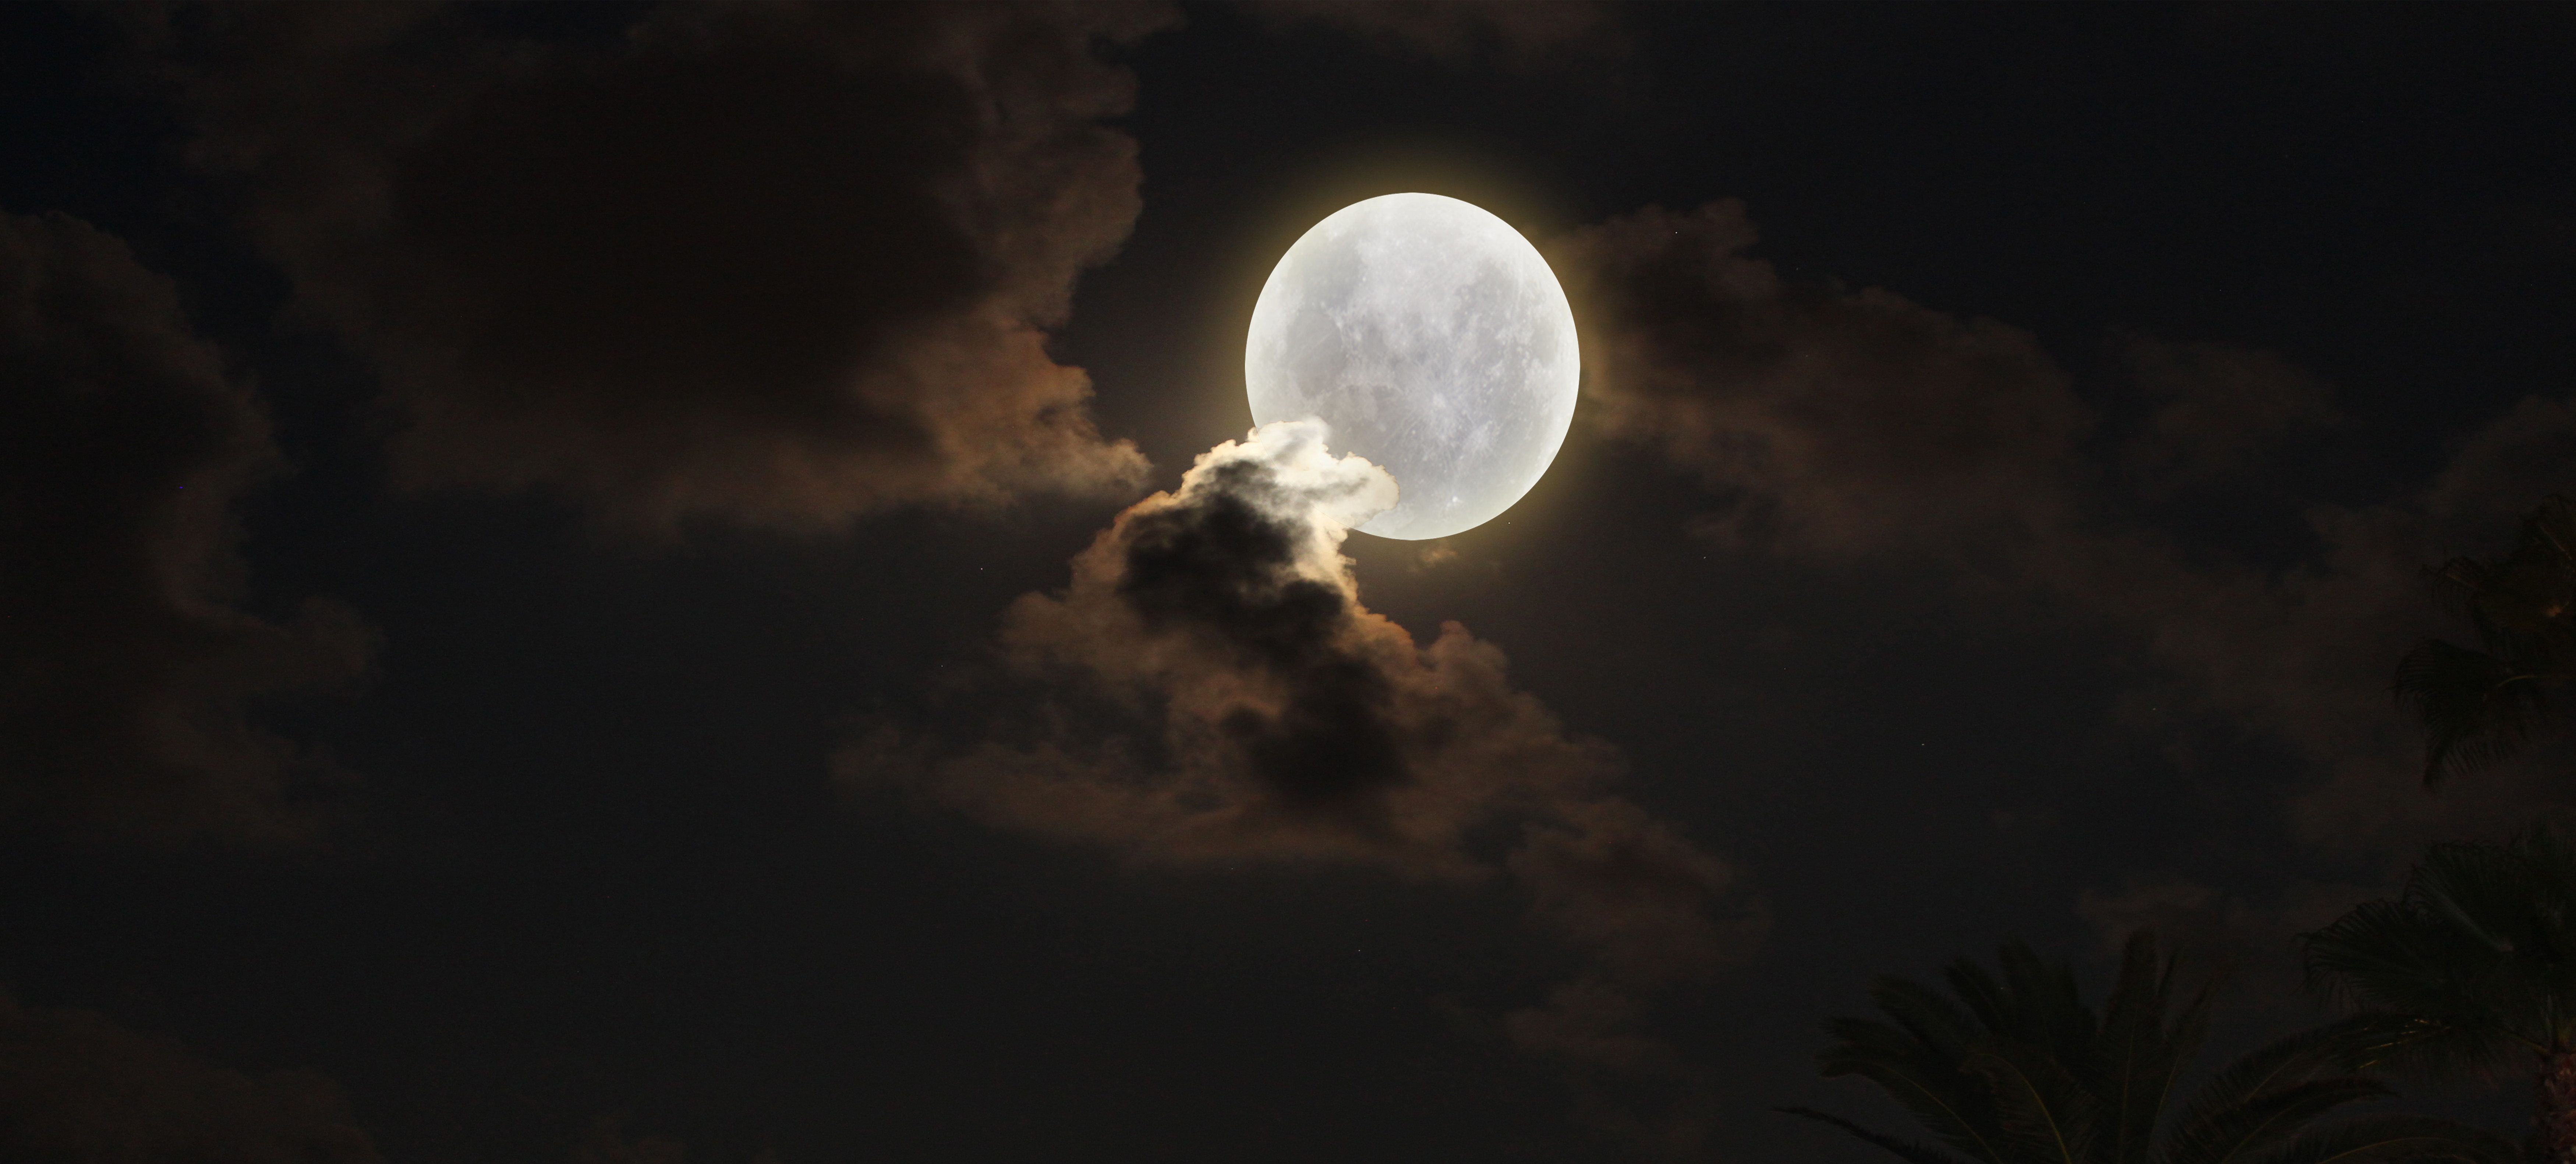 The Moon Puzzle: Ήρθε από τη Σελήνη και βγήκε σε δημοπρασία - Πόσο